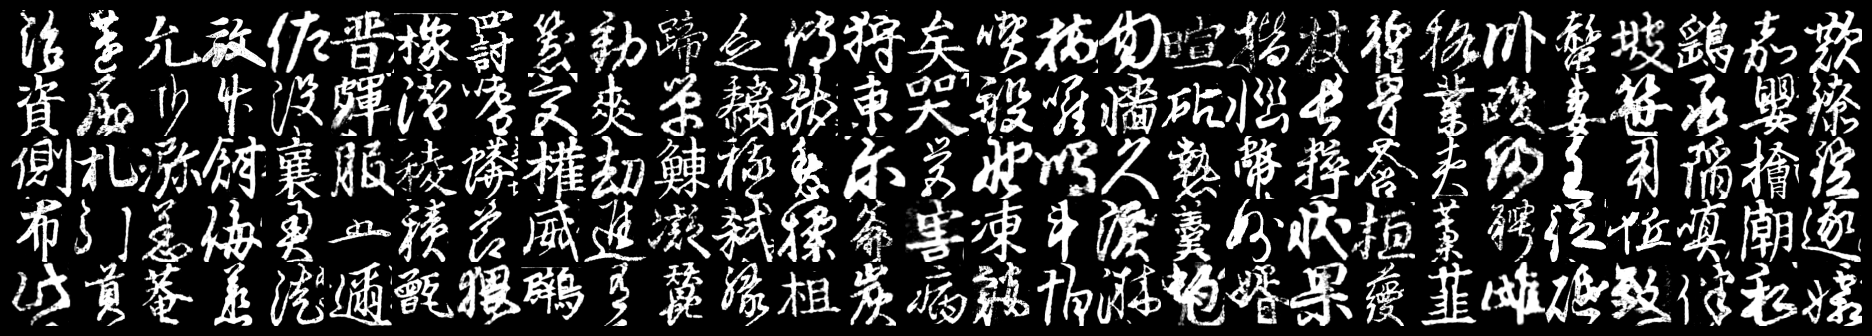 GitHub - IShengFang/TypographyResearchCollection: The research